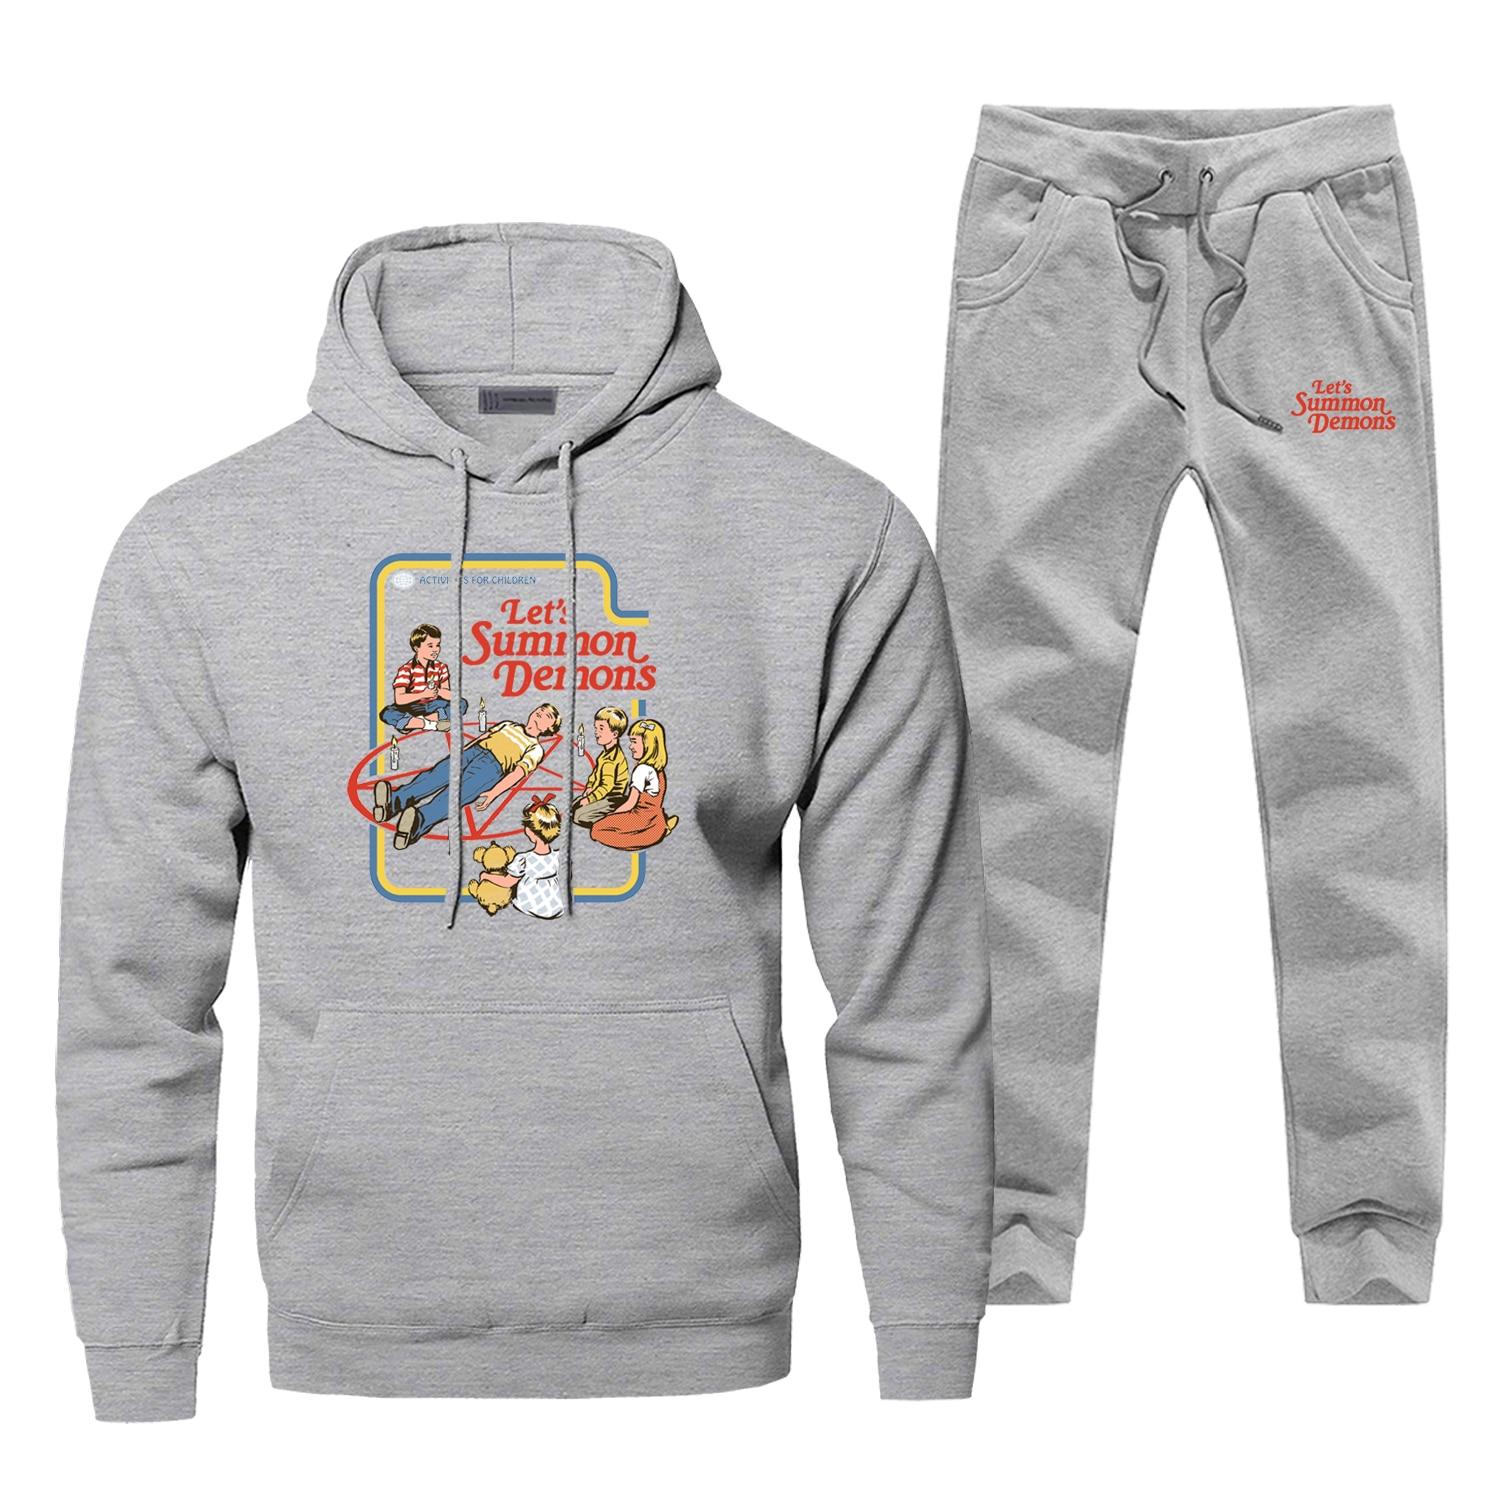 2019 New Men's Full Suit Tracksuit Let's Summon Demons Funny Print Comfortable Pants Sweatshirt Fleece Casual Sportsman Wear